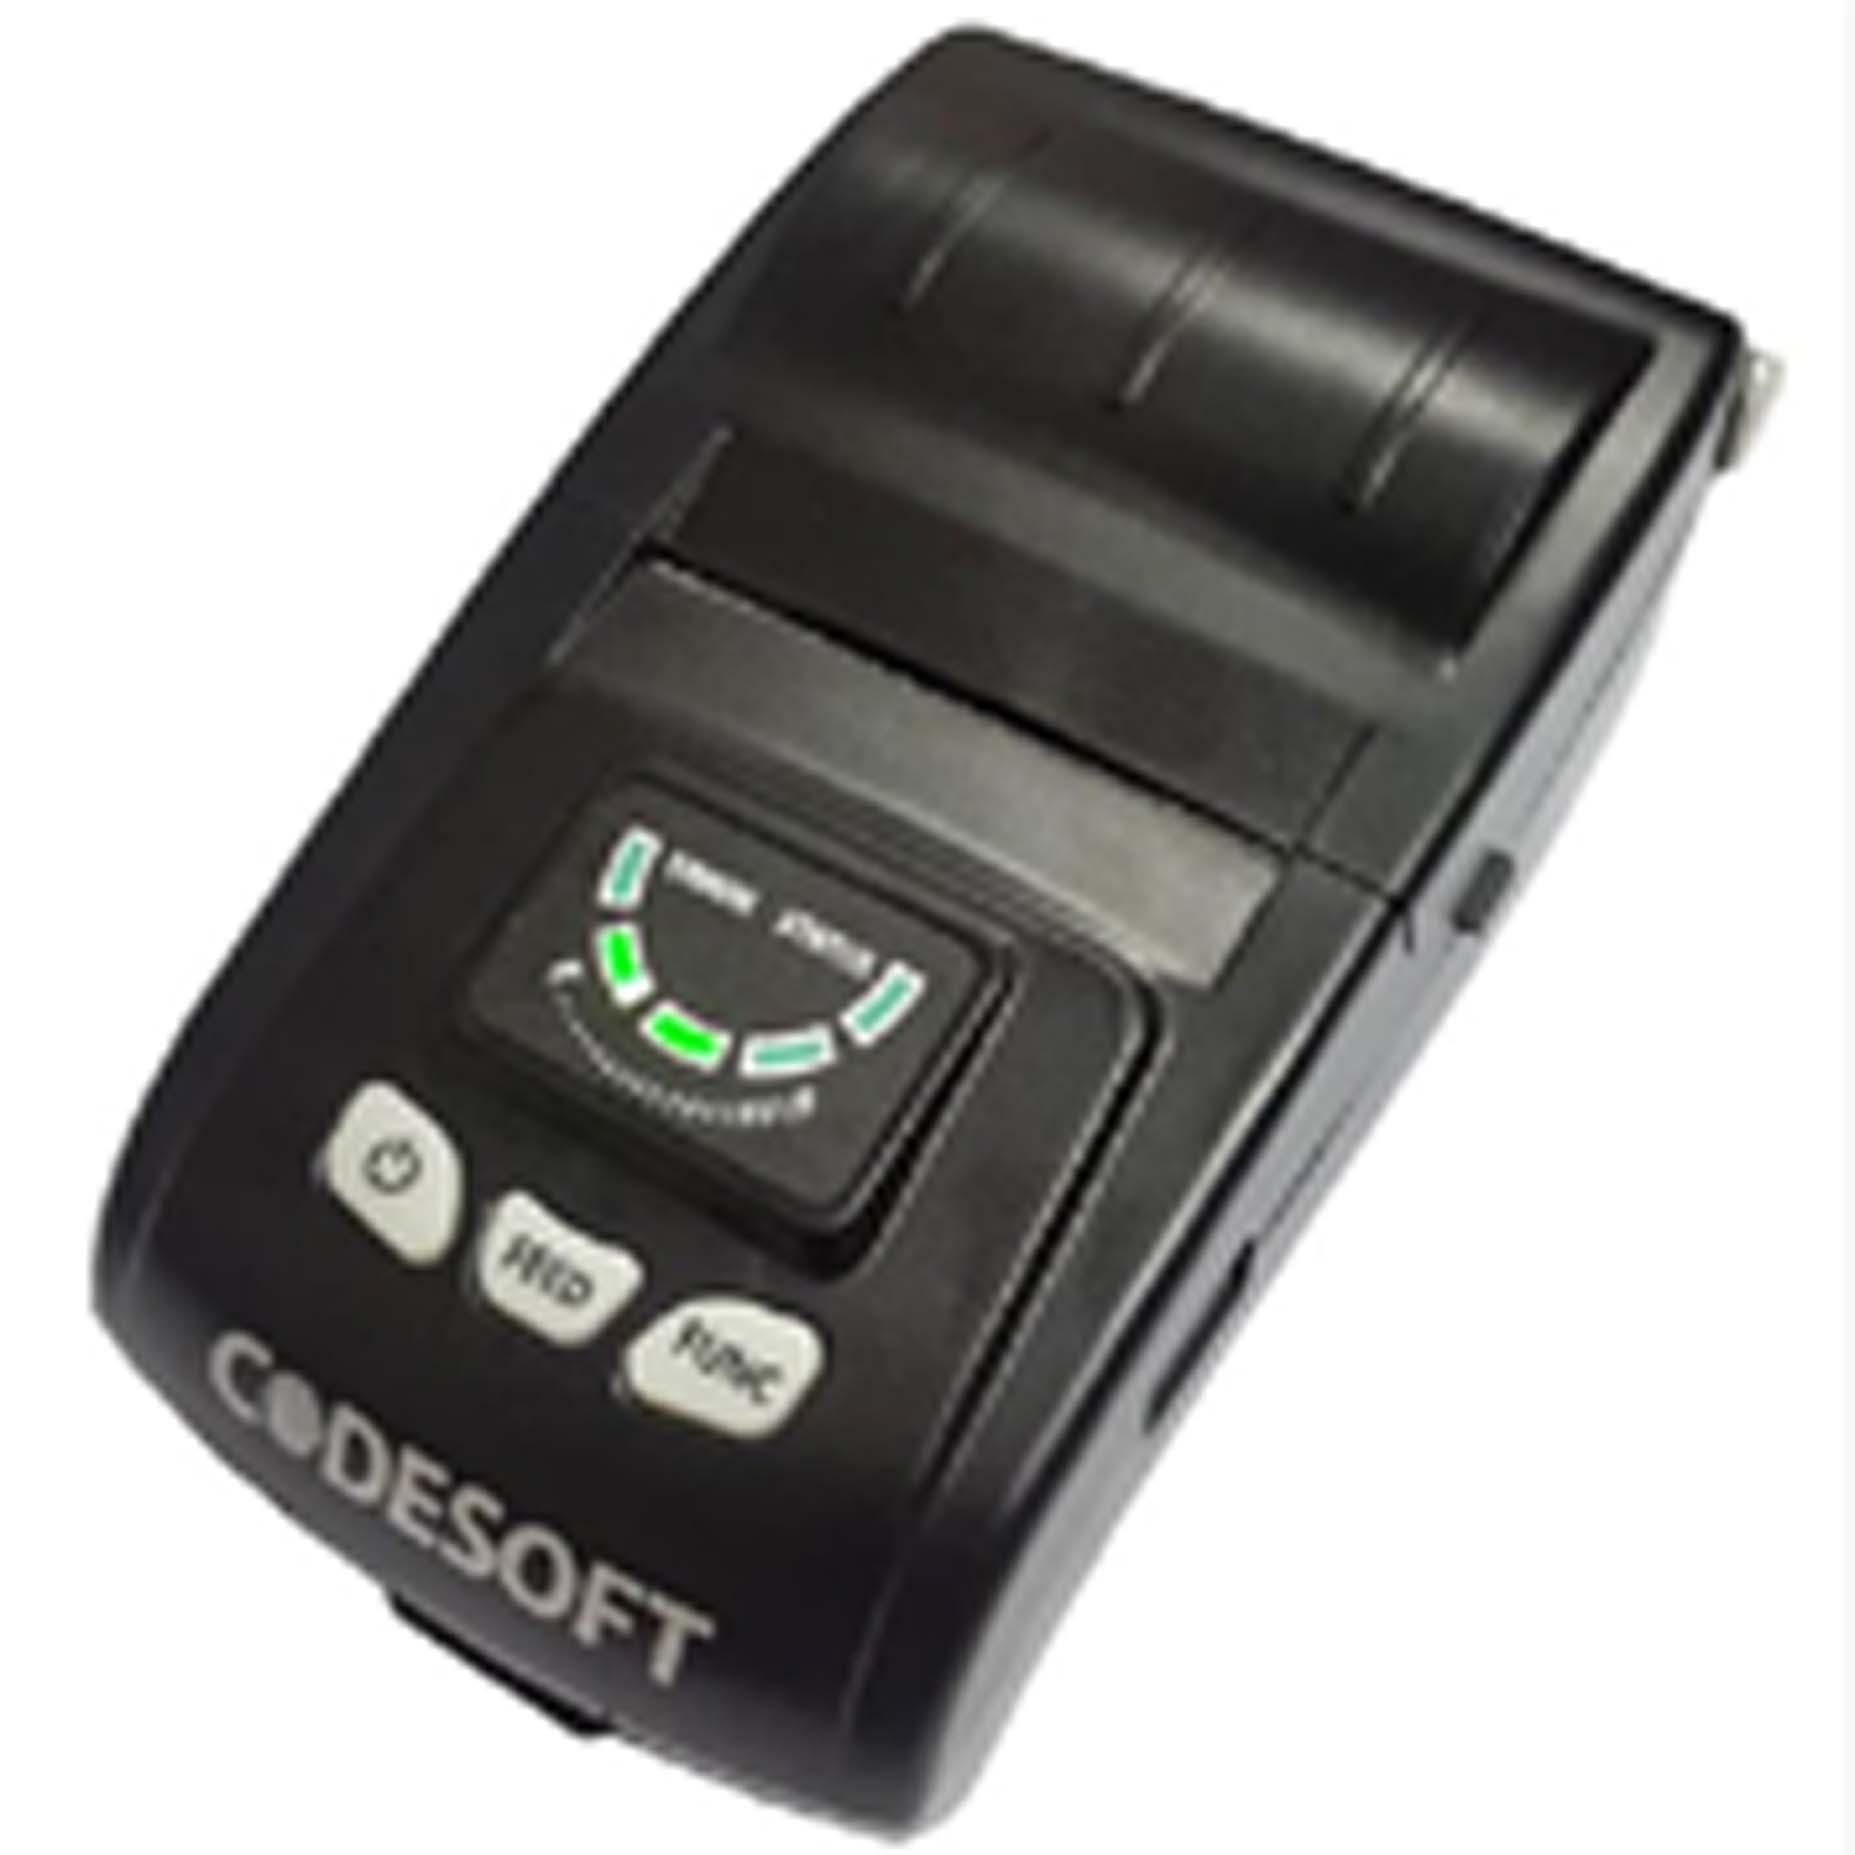 Harga Codesoft HP-M200 Portable Printer